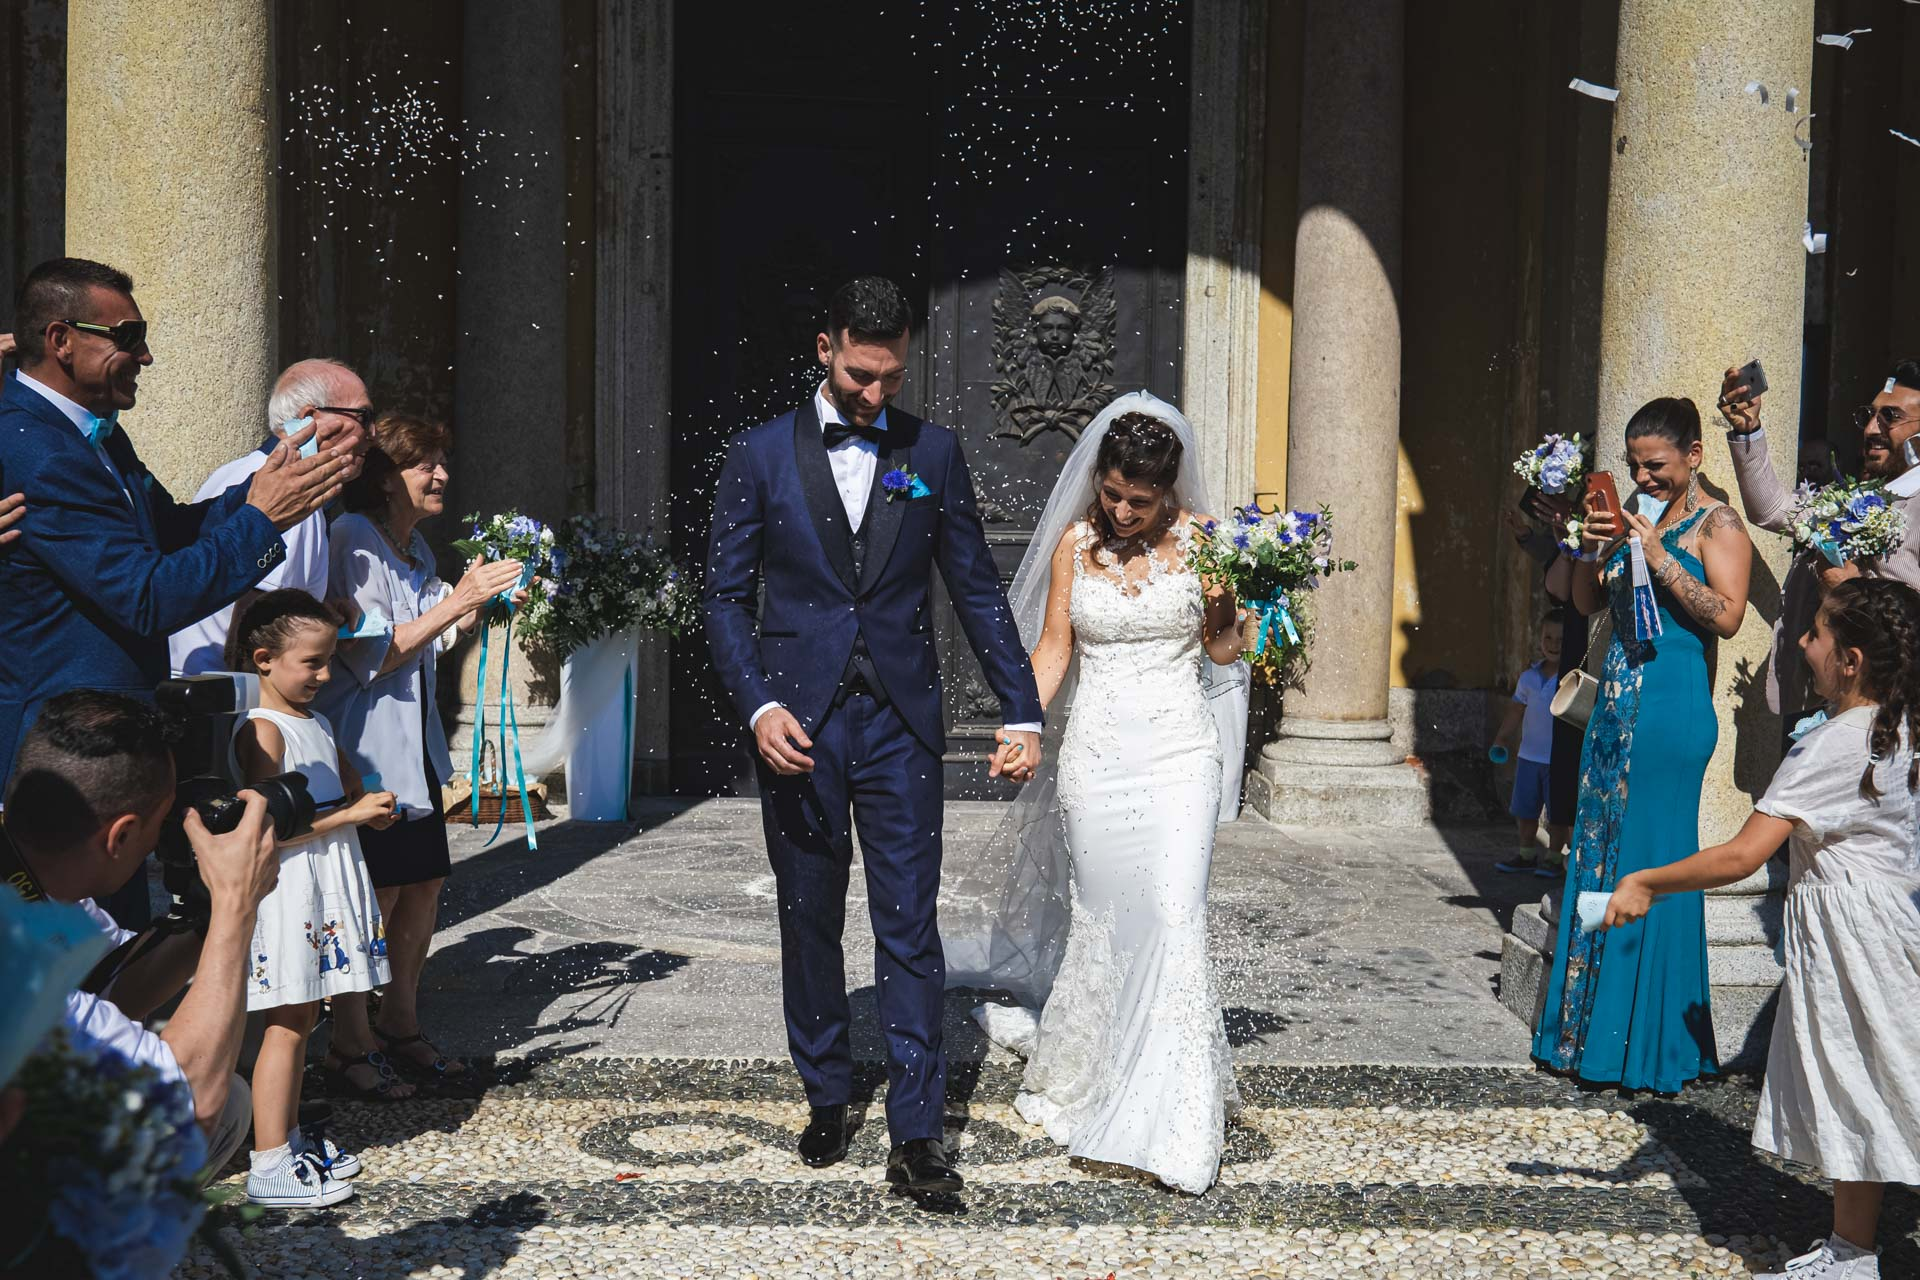 chiesa sagrato matrimonio sposi invitati